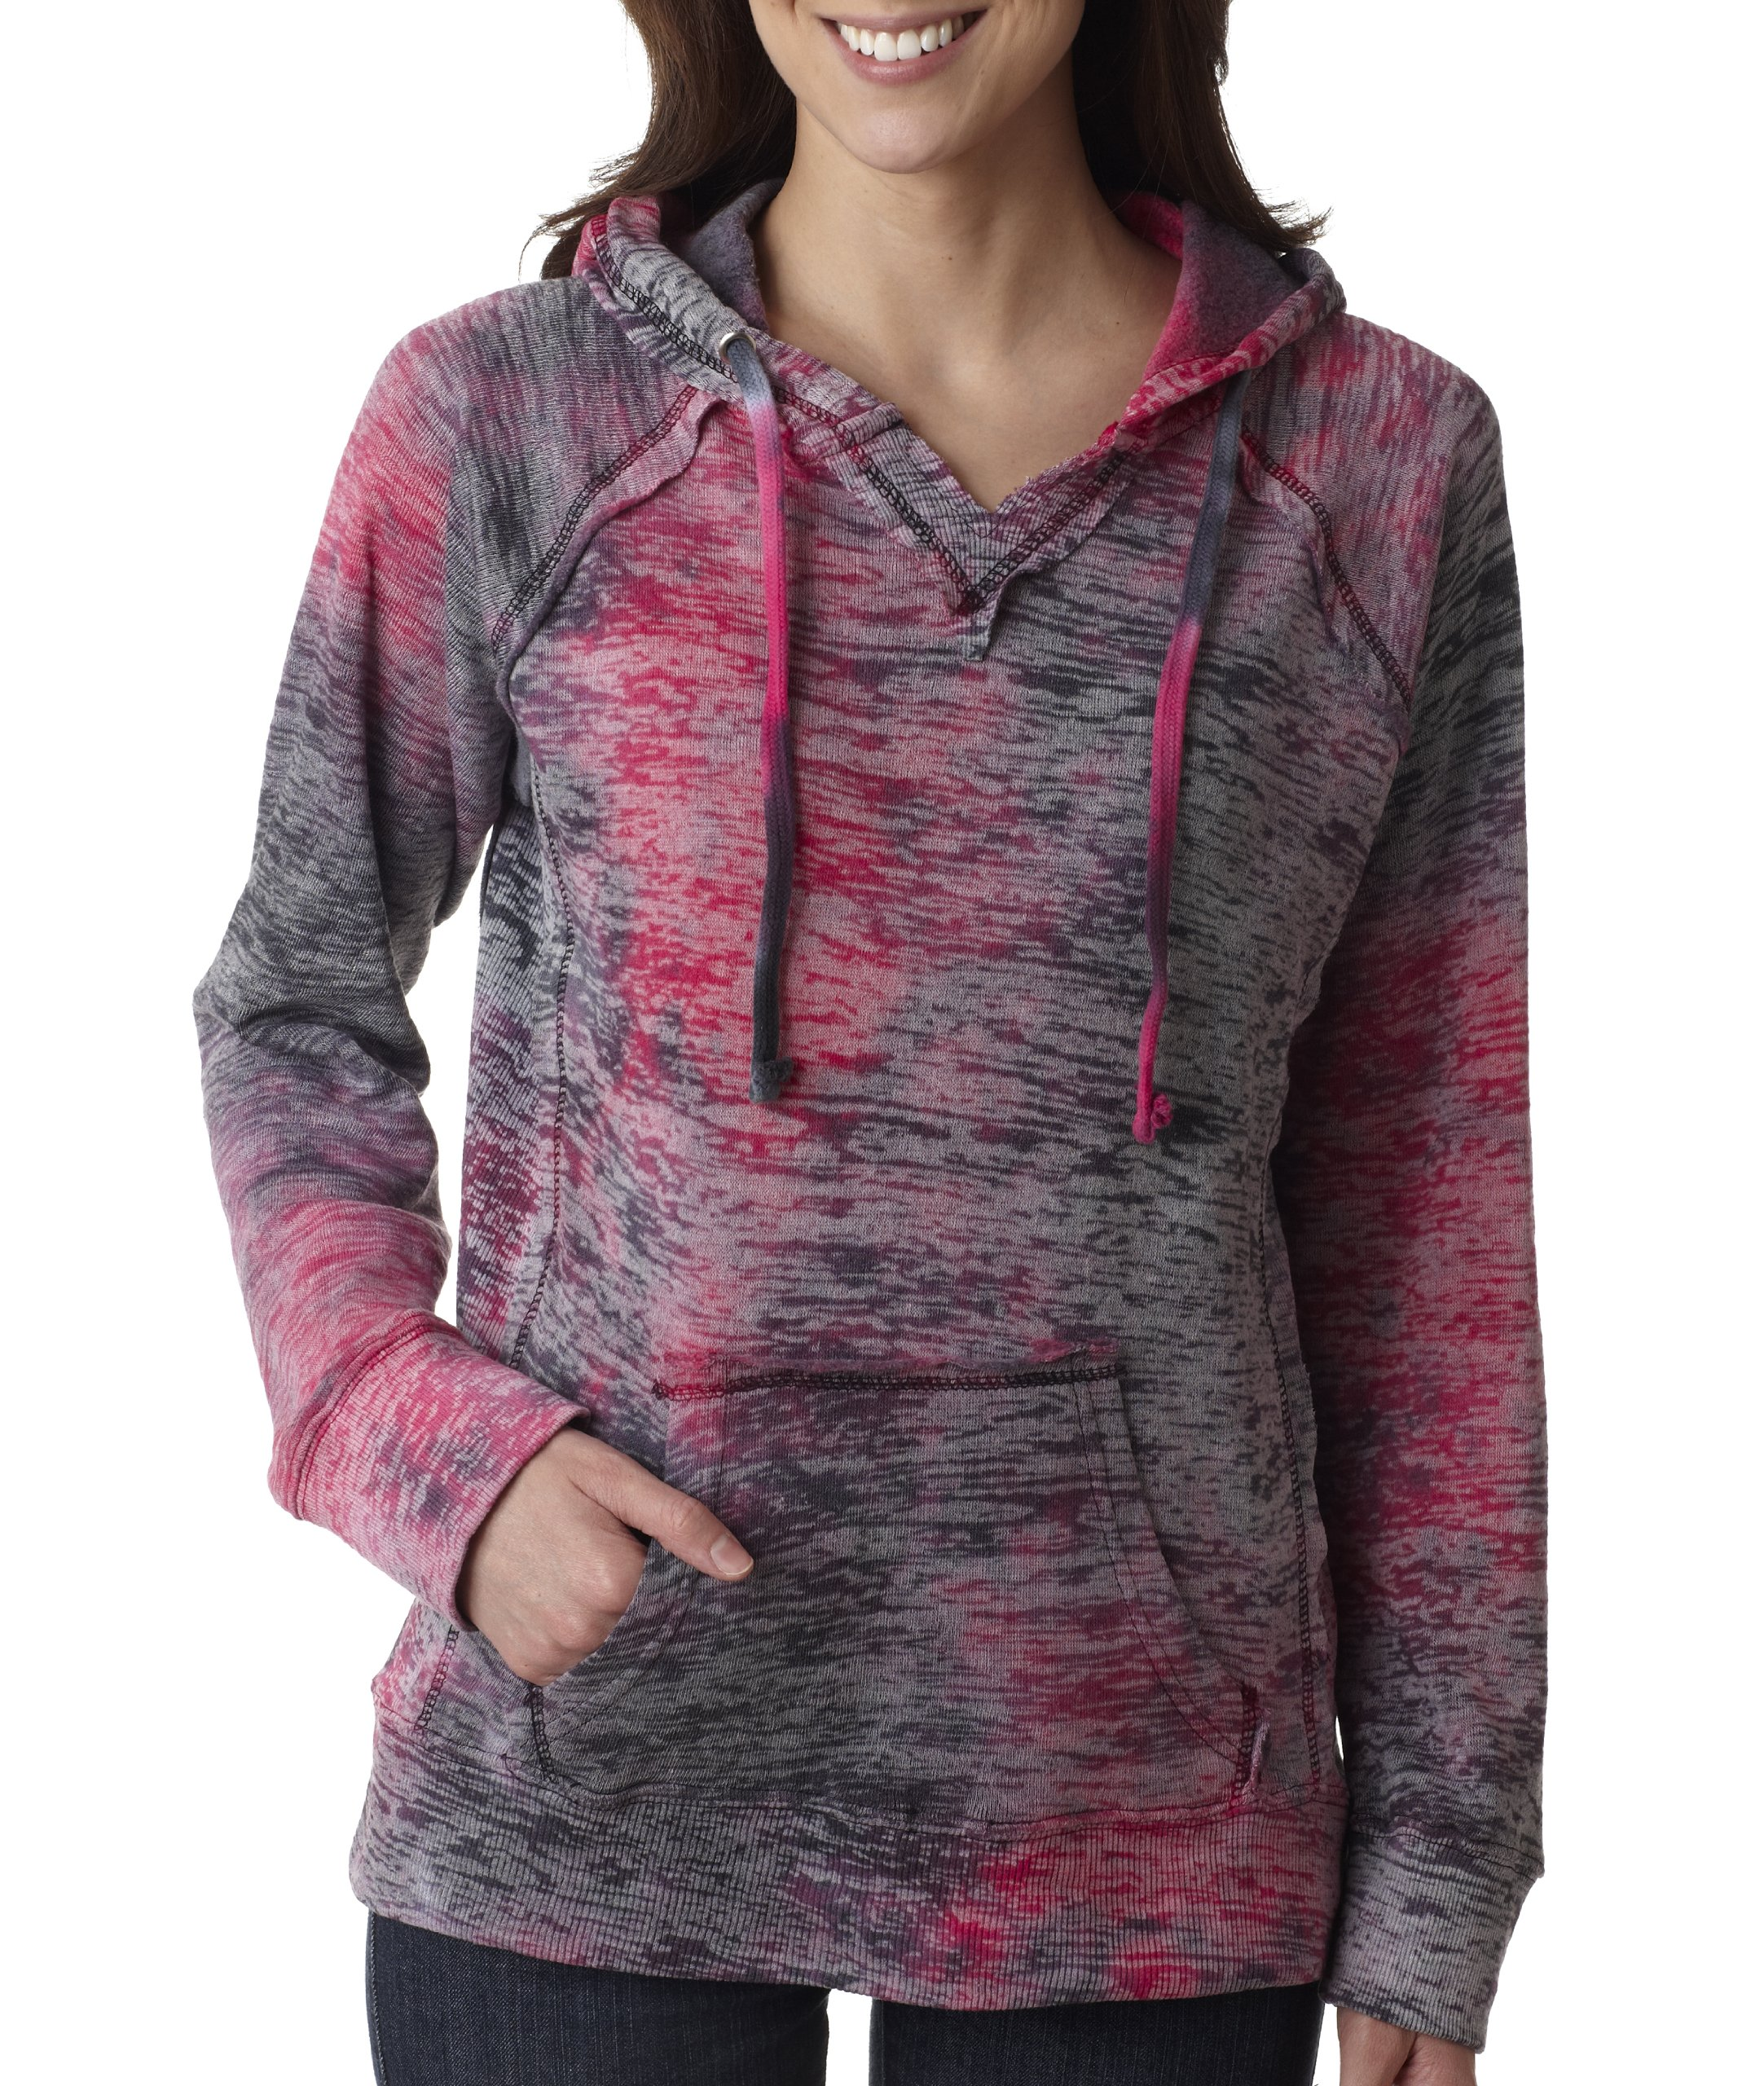 MV Sport Women's Courtney Burnout Hooded Pullover Blend Fleece (Raspberry Swirl) (2X-Large)